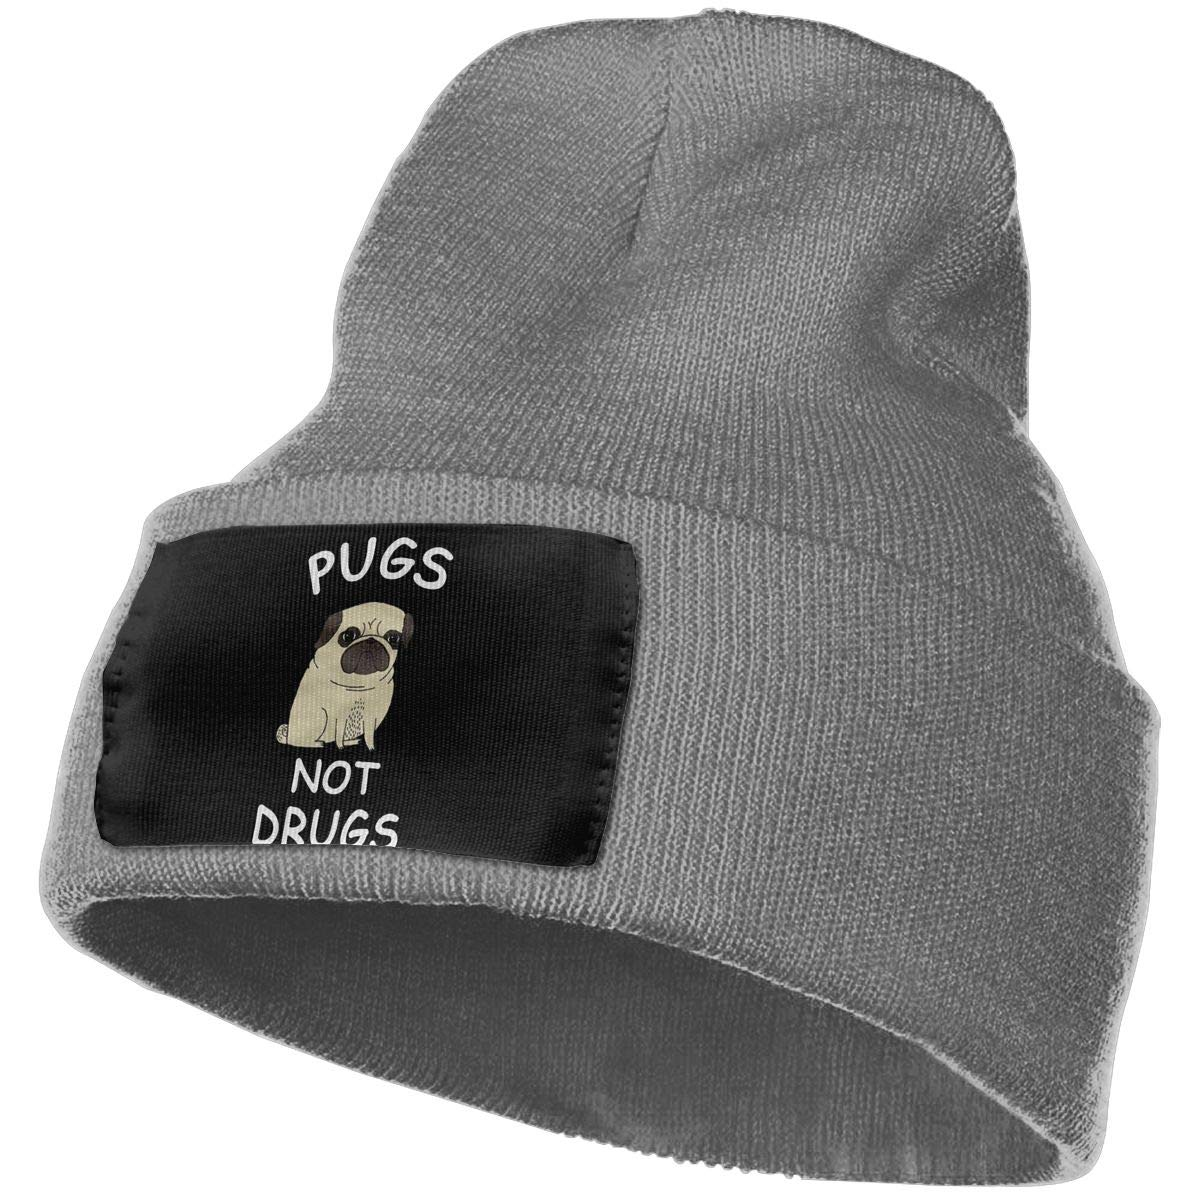 SLADDD1 Pug Dog Warm Winter Hat Knit Beanie Skull Cap Cuff Beanie Hat Winter Hats for Men /& Women